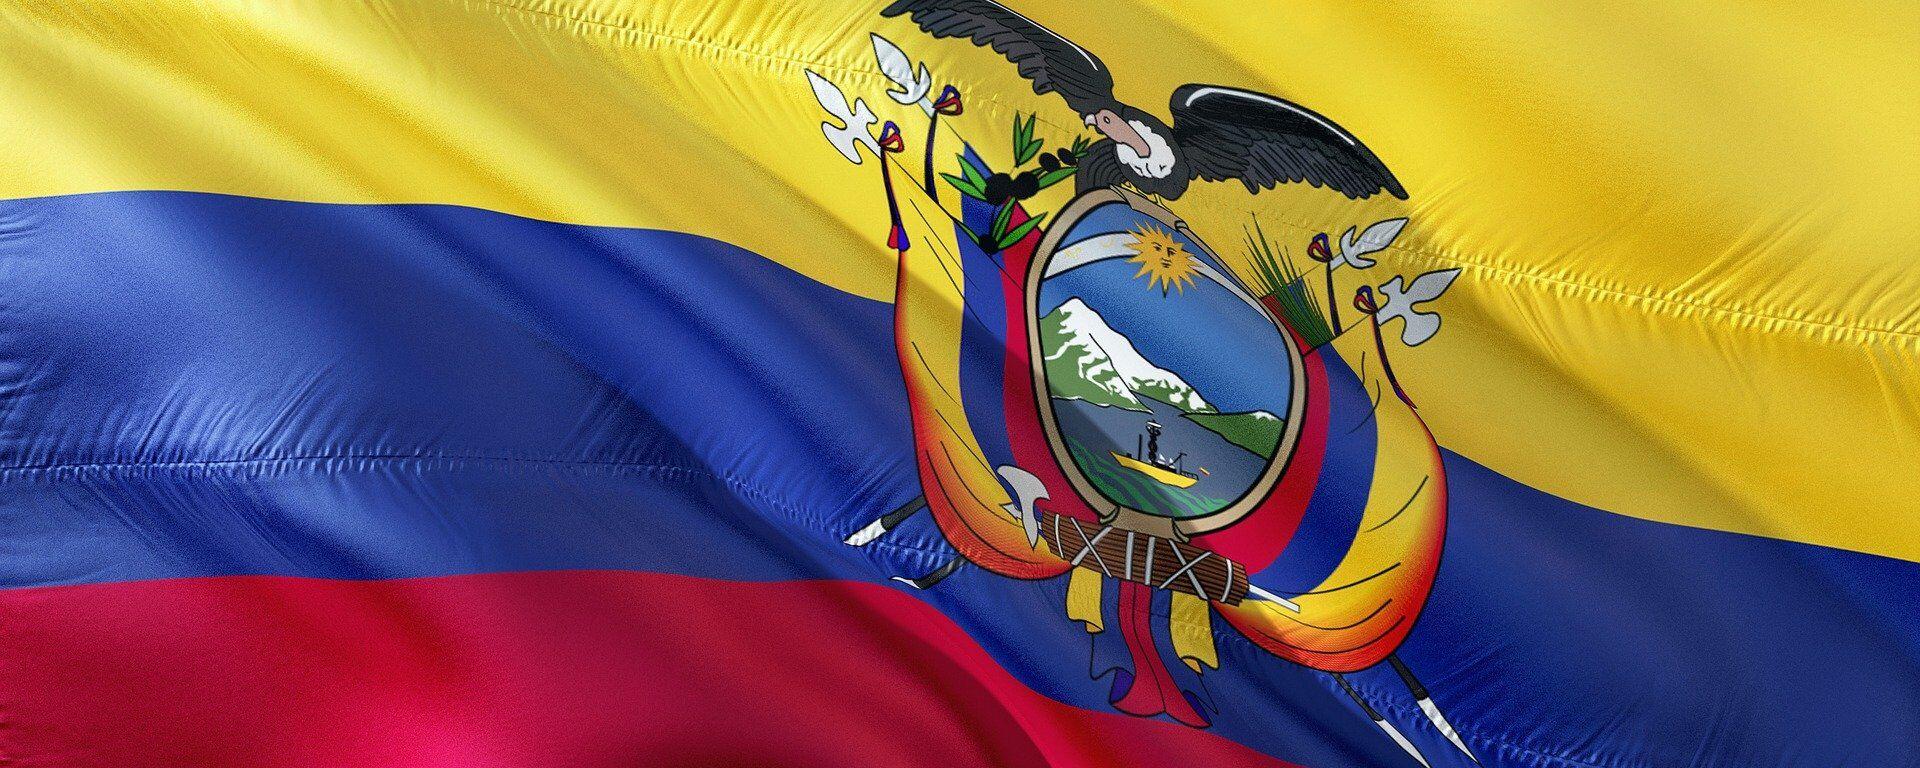 La bandera de Ecuador - Sputnik Mundo, 1920, 11.12.2020